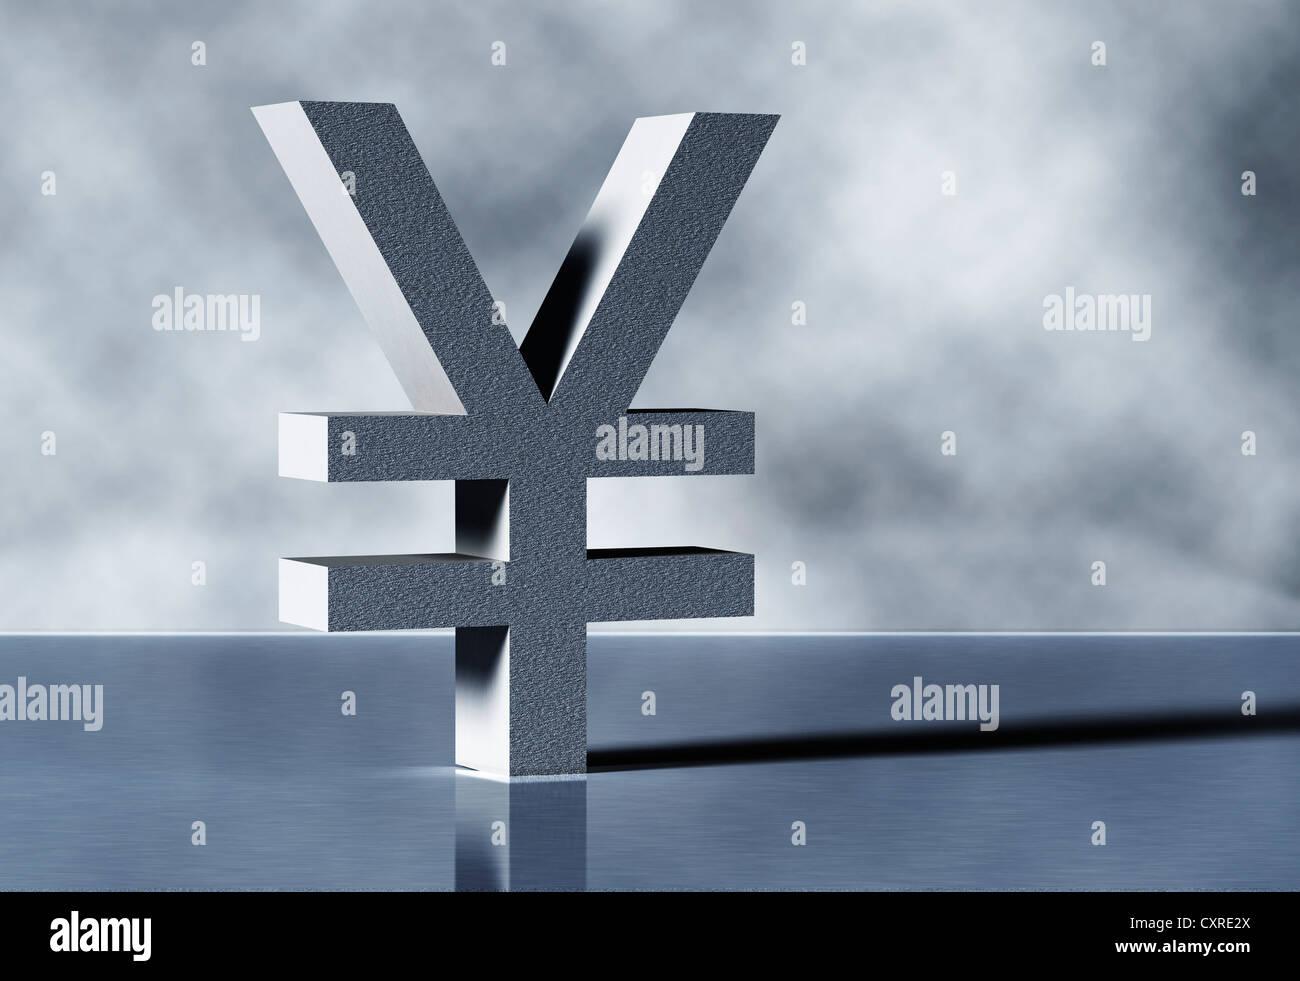 Yen symbol - Stock Image